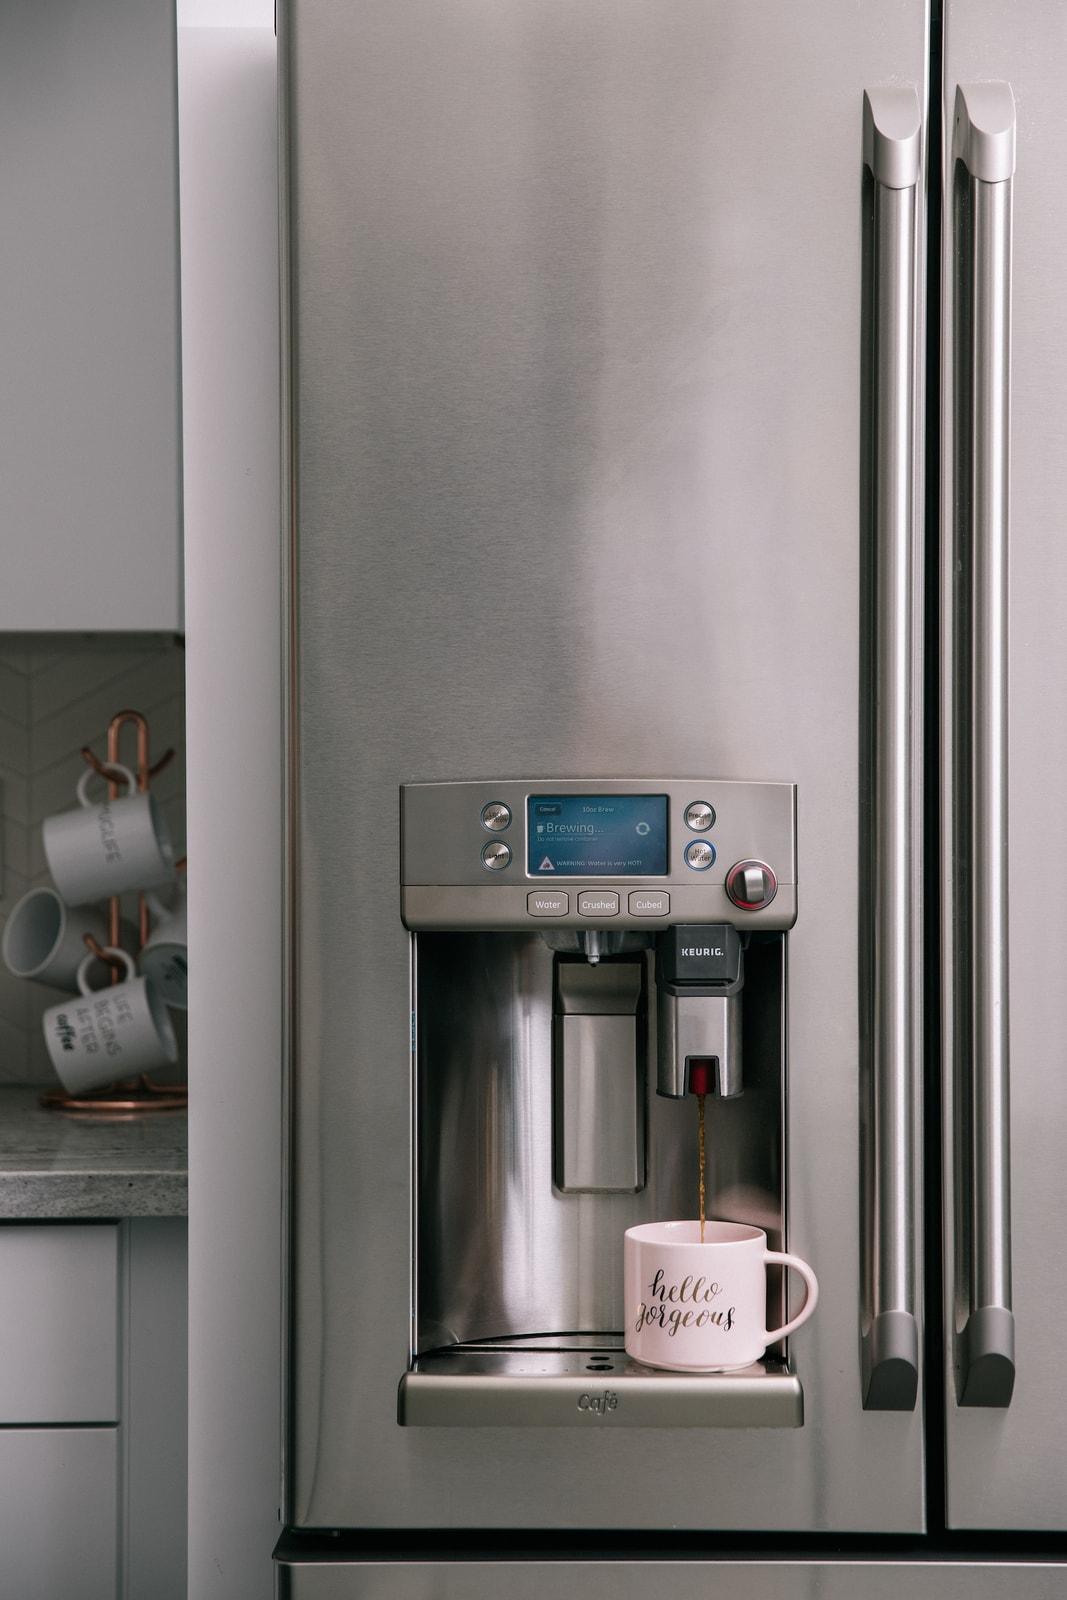 GE Wifi Cafe Smart Refrigerator with Built In Keurig